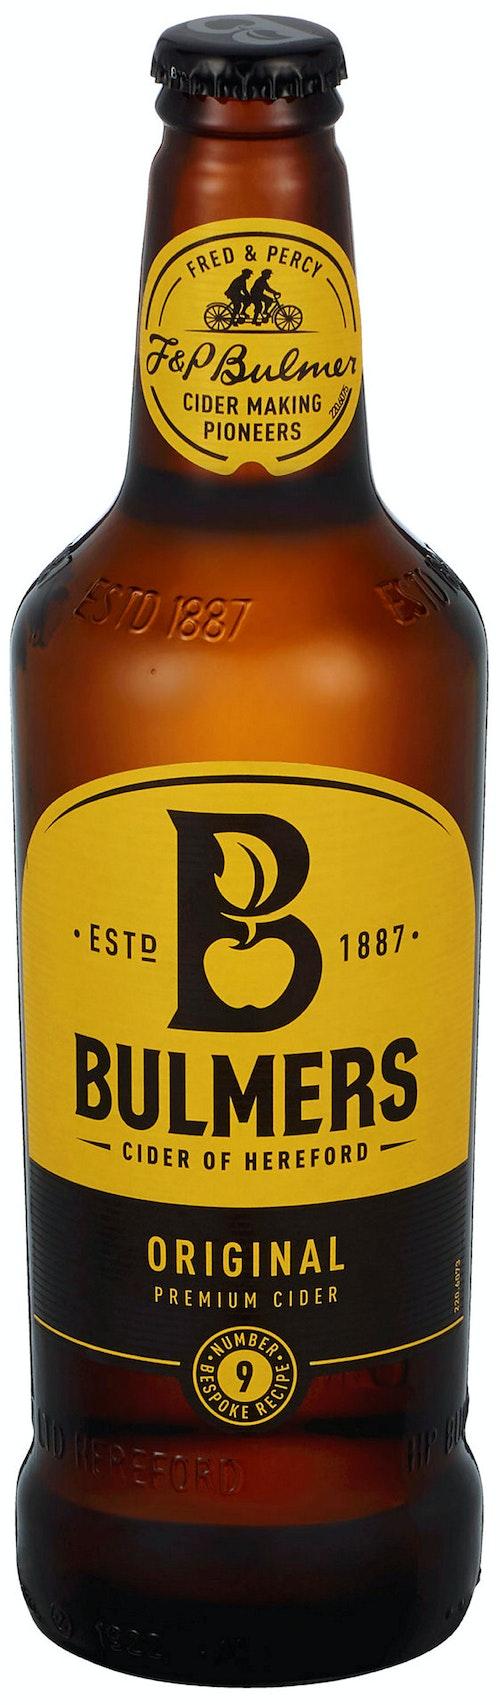 Bulmers Original Cider 4,5%, 0,5 l